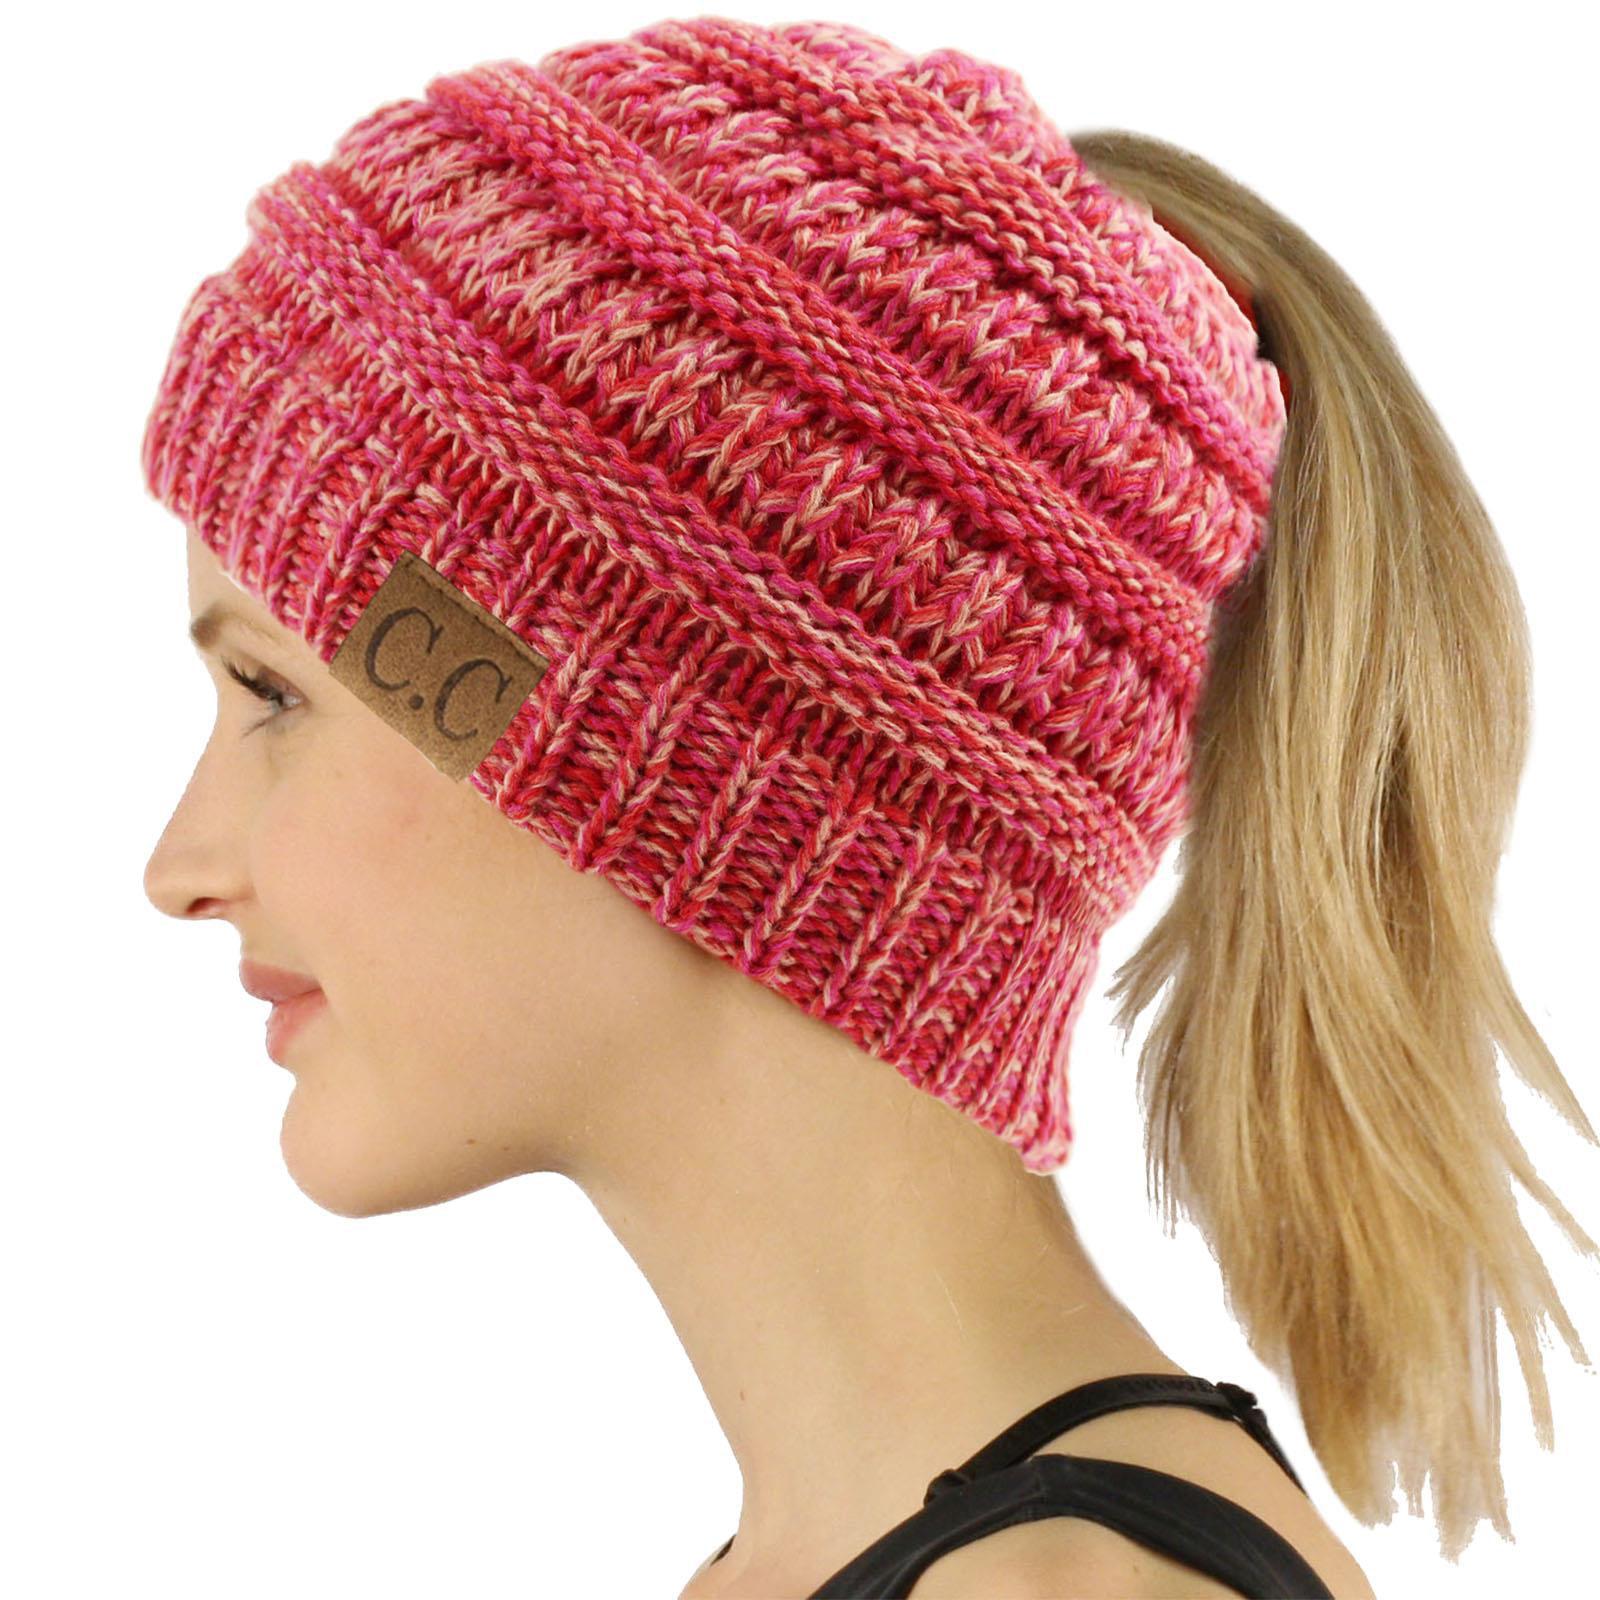 fbc4cab7f7a SK Hat Shop - CC Ponytail Messy Bun BeanieTail Soft Winter Knit Stretchy  Beanie Hat Cap - Walmart.com